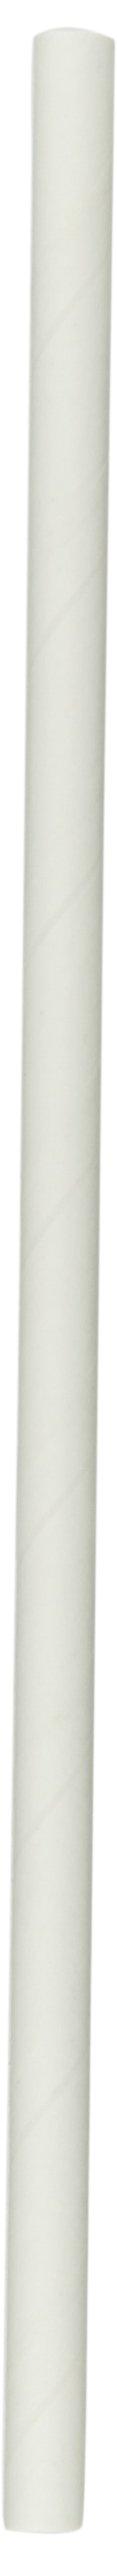 Aardvark 61500206 Unwrapped Paper Jumbo Drinking Straw, 7/32'' Diameter x 7-3/4'' Length, White (8 Boxes of 600)